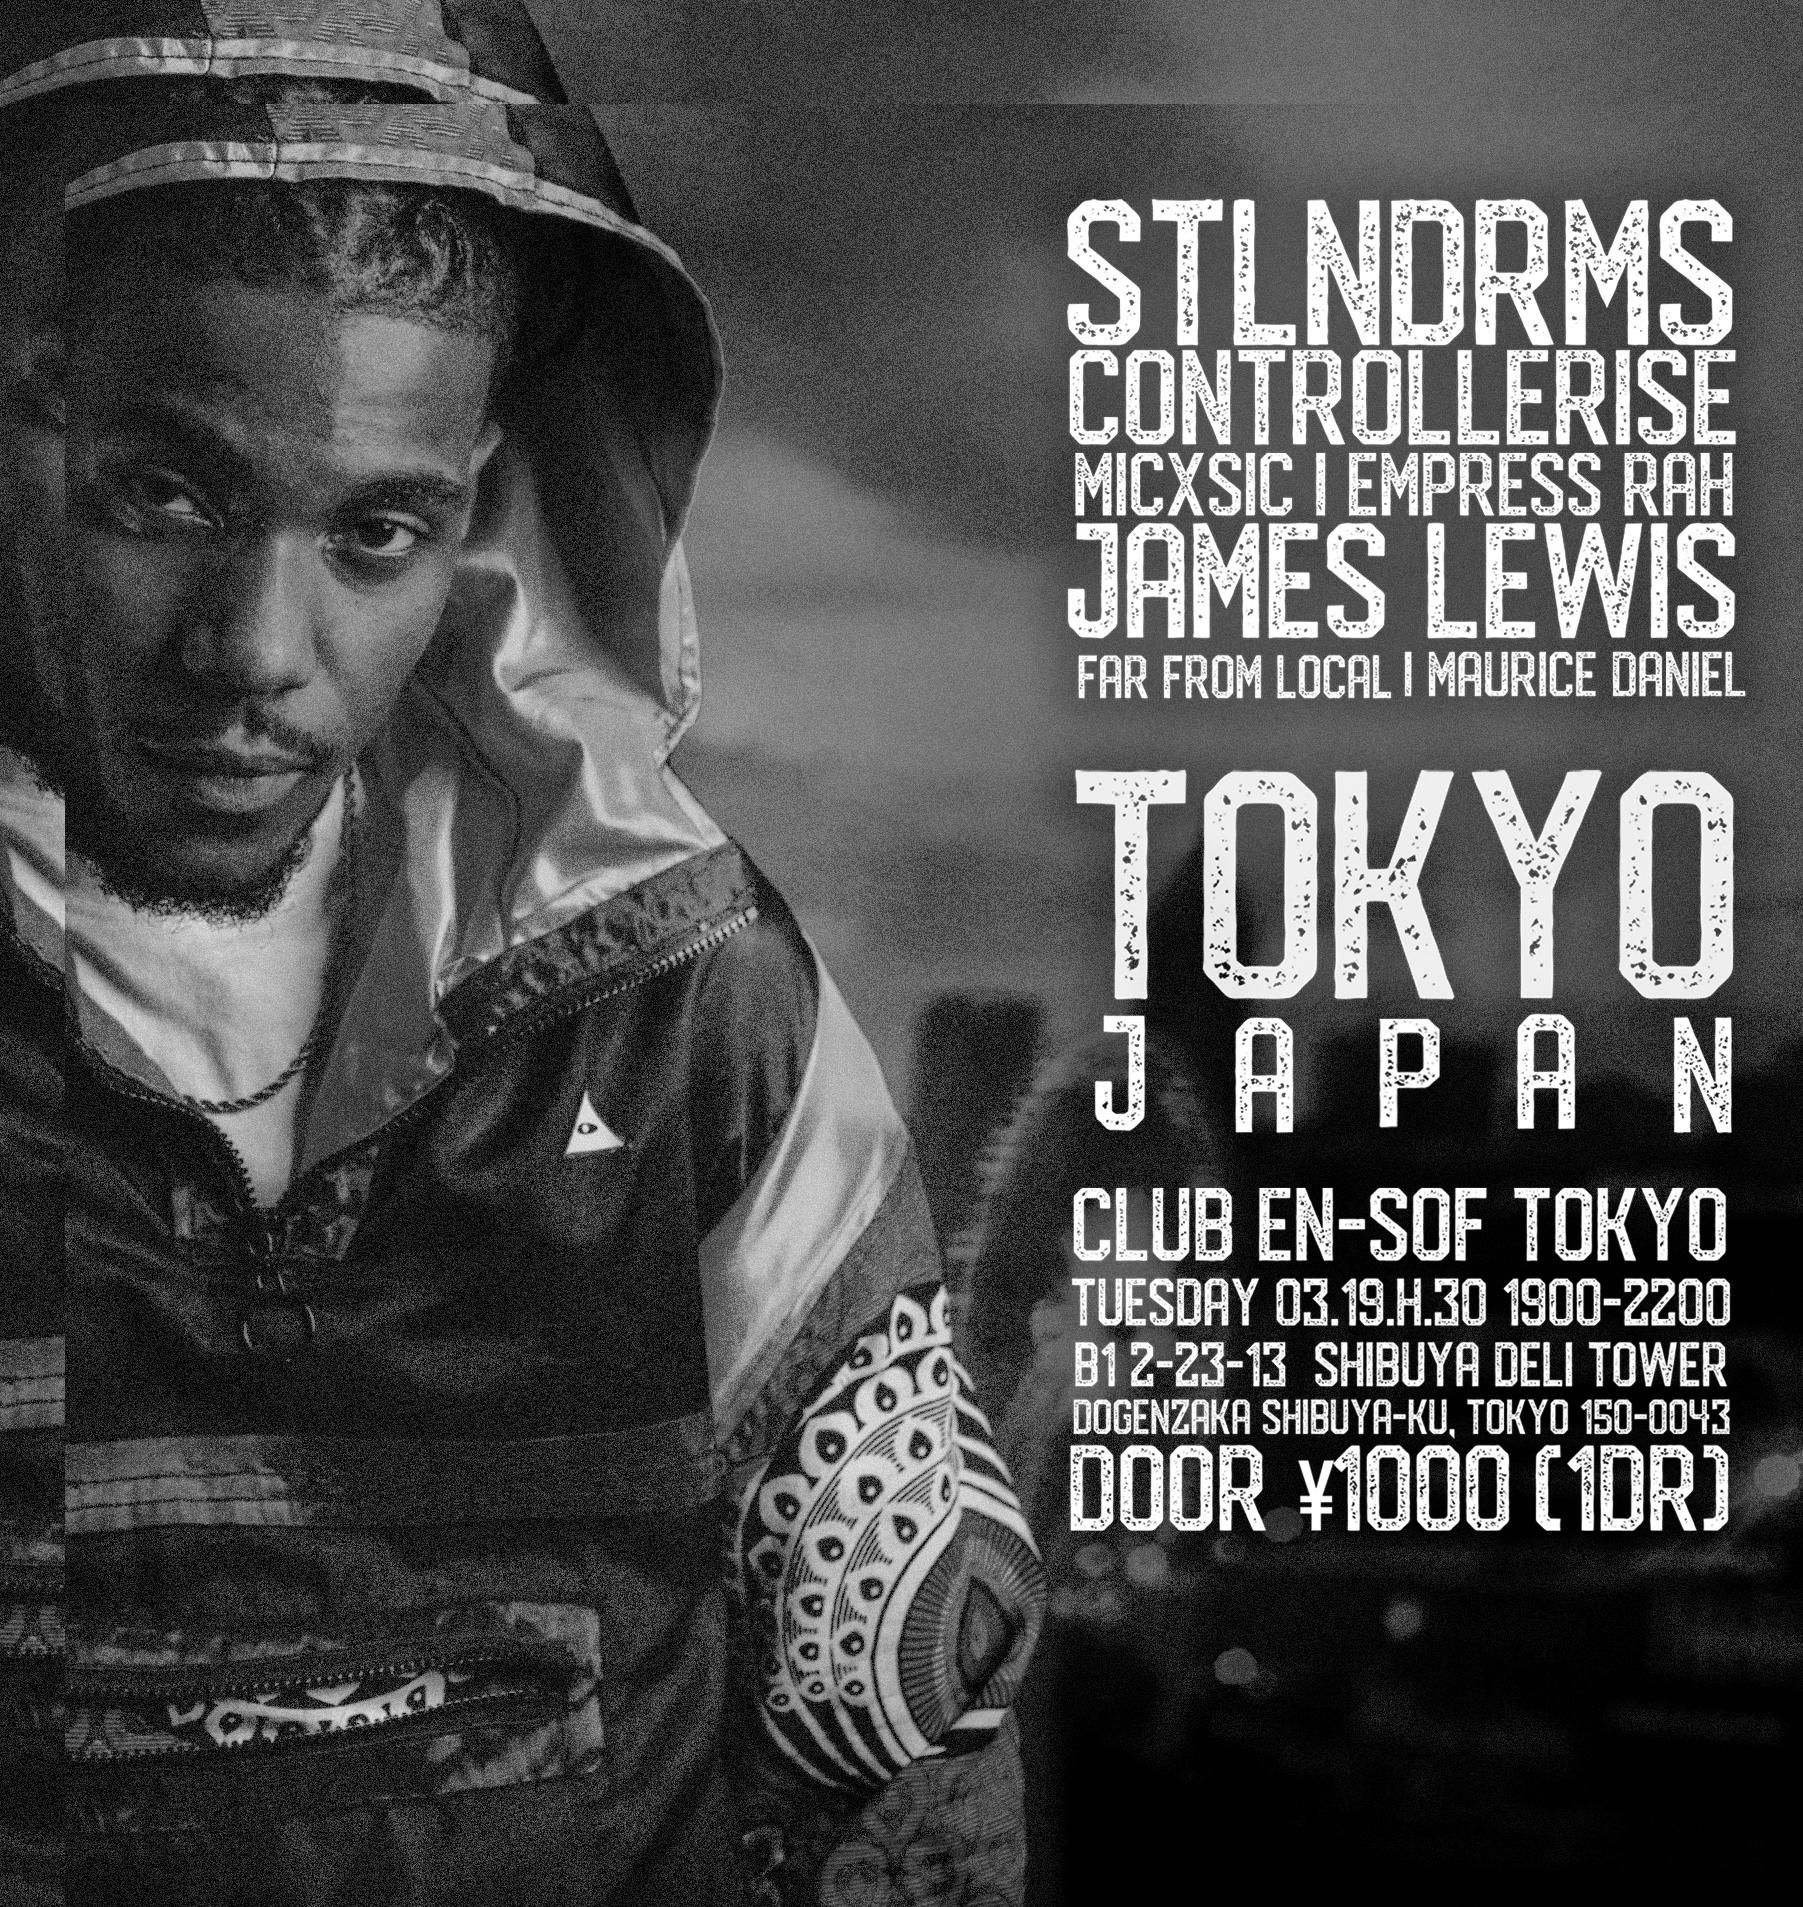 James lewis Japan, Tokyo,